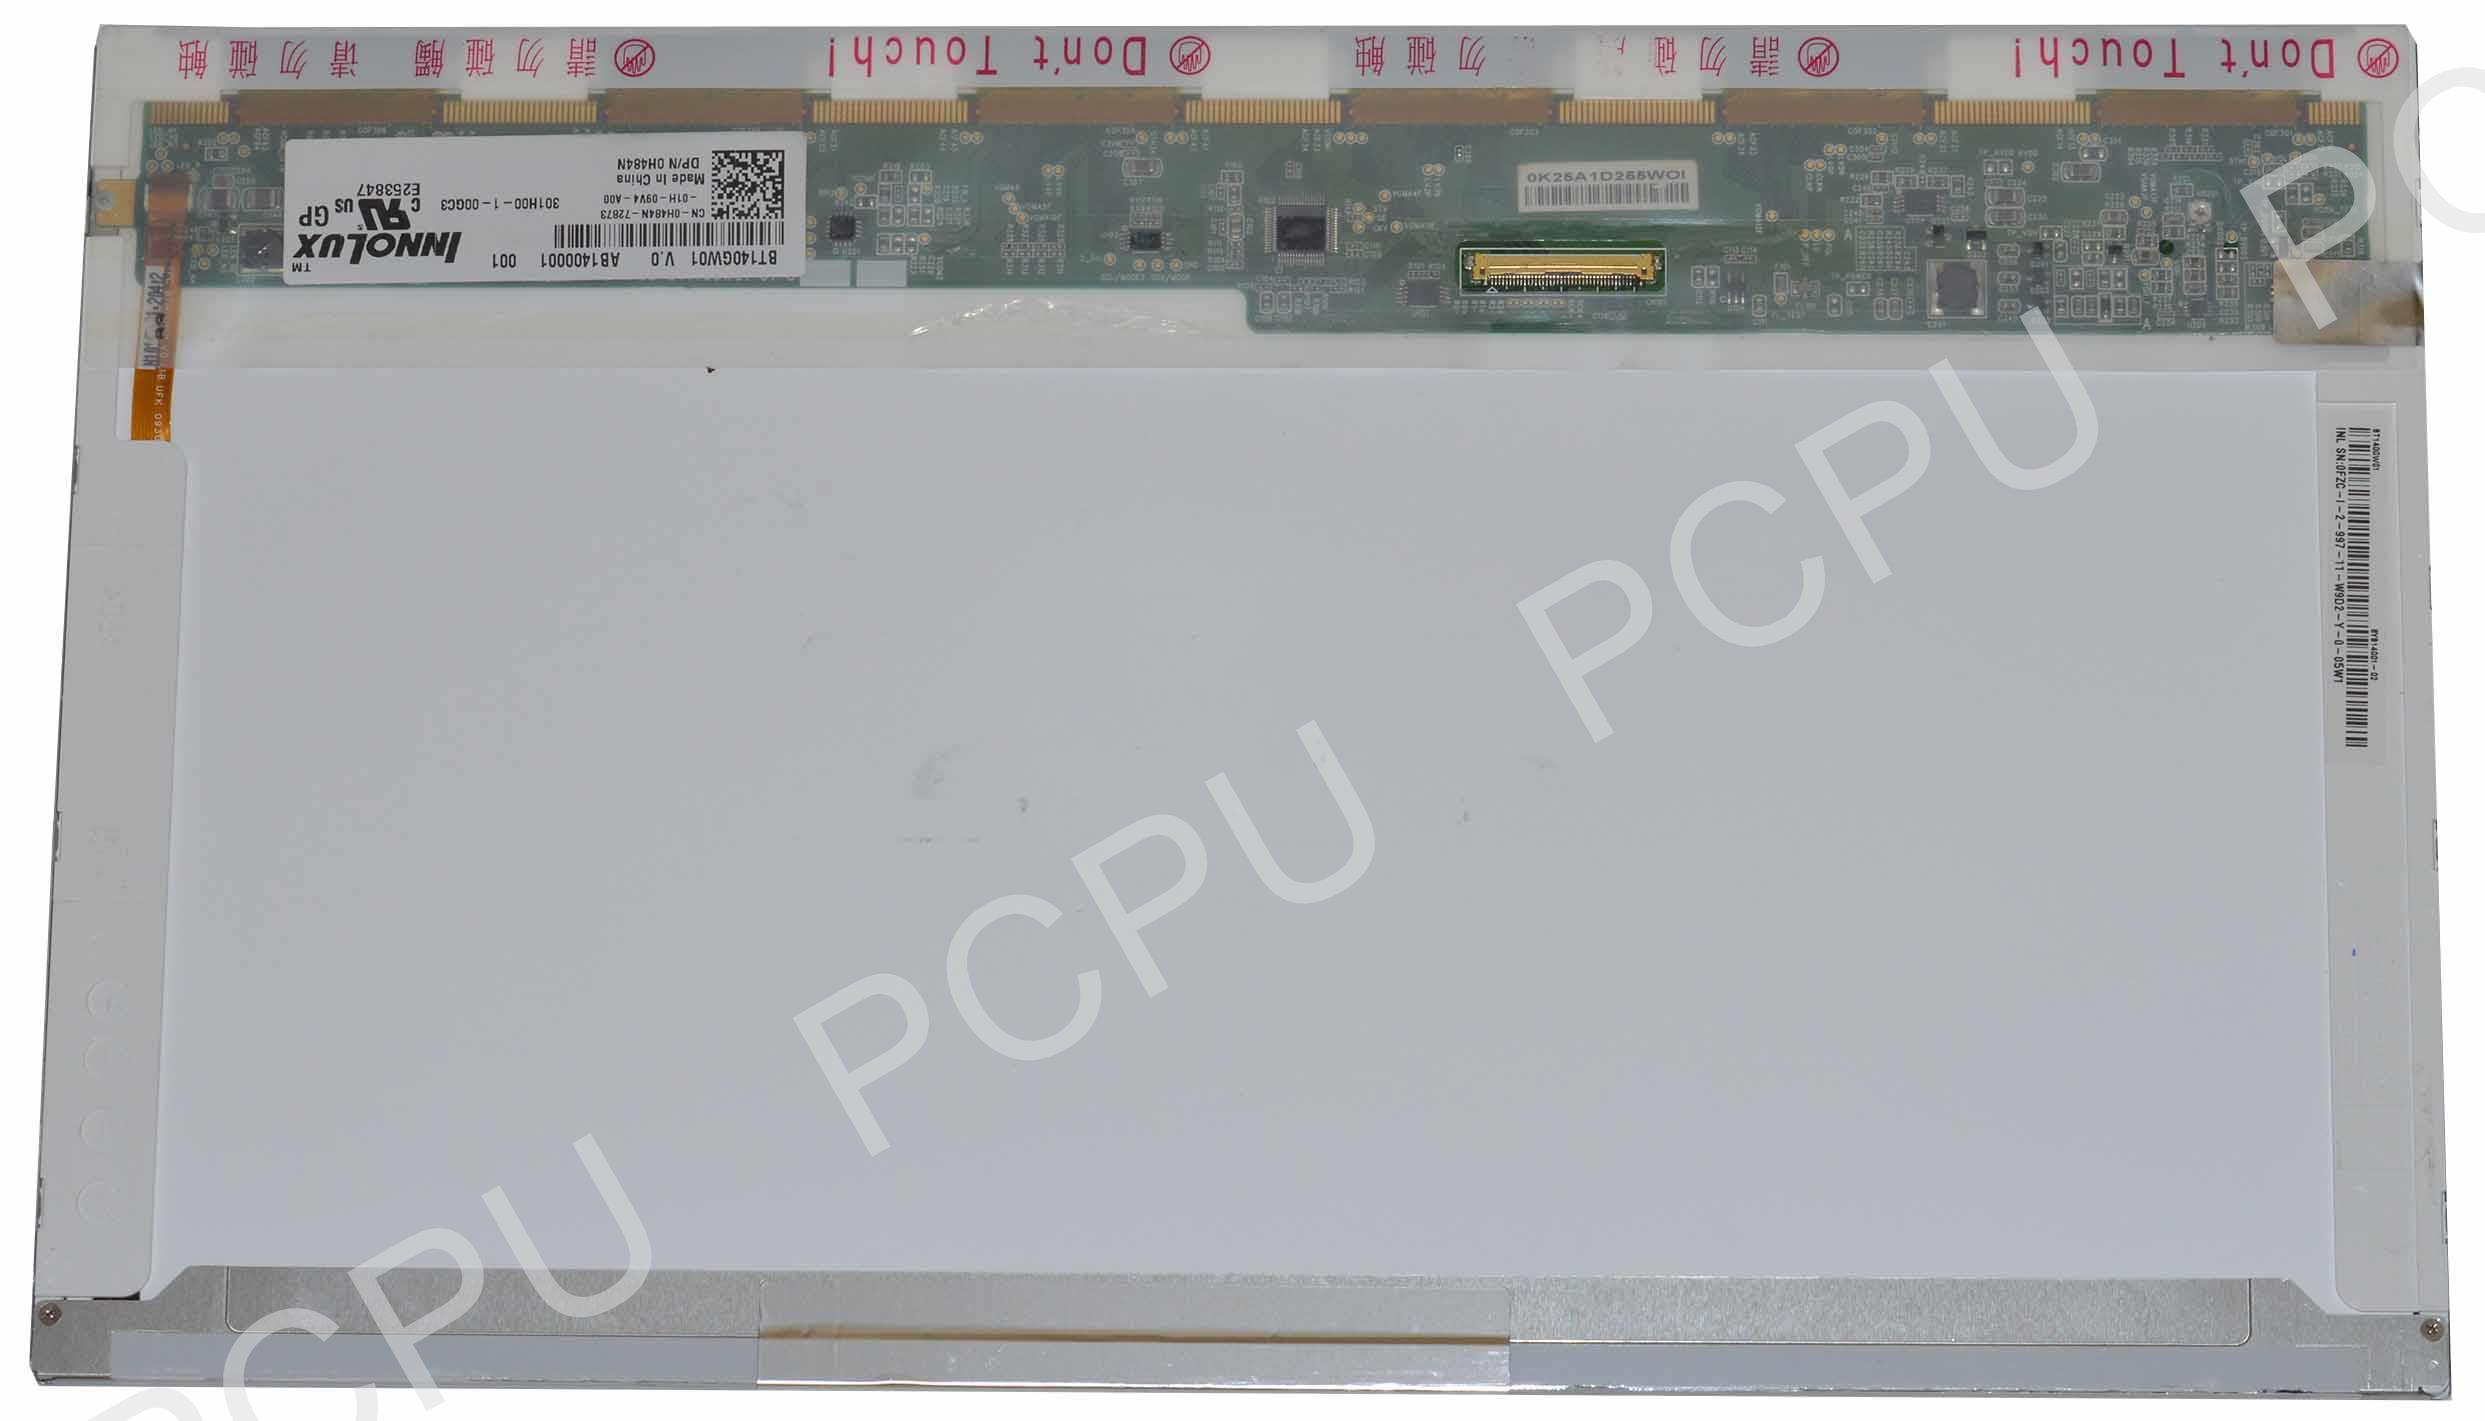 NYCPUFAN USB 2.0 Wireless WiFi LAN Card for HP-Compaq Pavilion Slimline S3240.UK